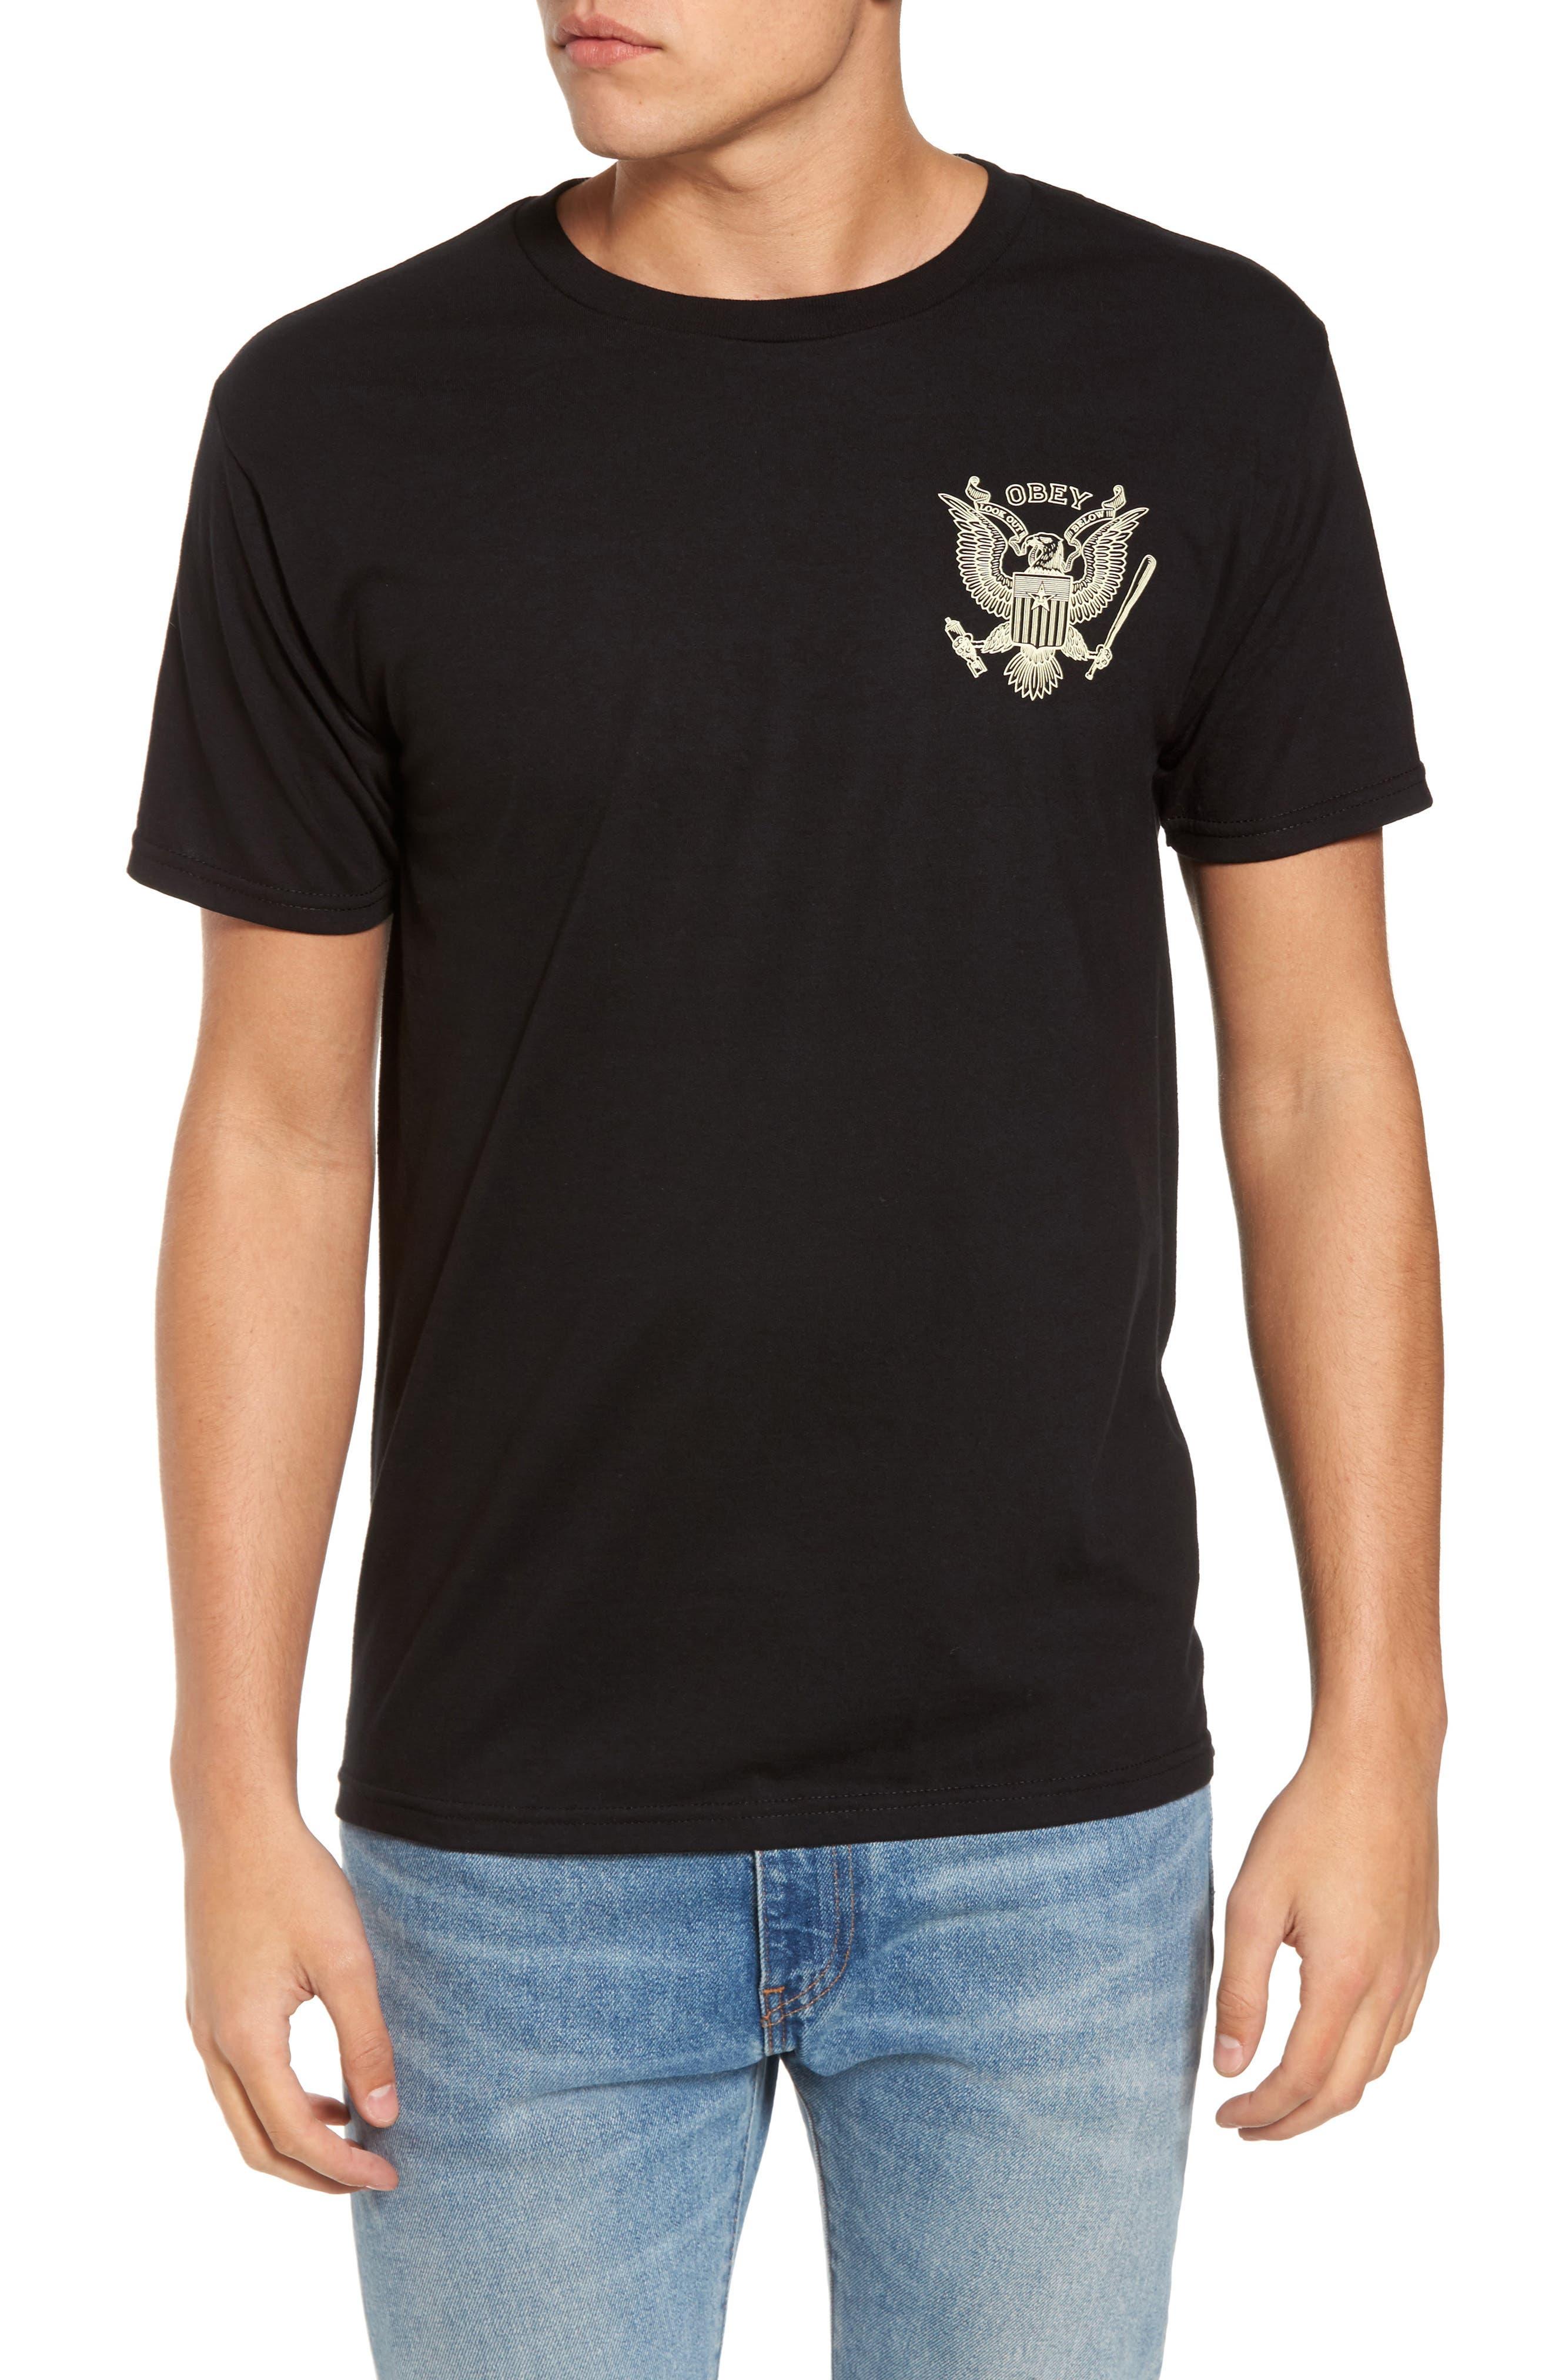 Look Out Below Premium Graphic T-Shirt,                             Main thumbnail 1, color,                             Black